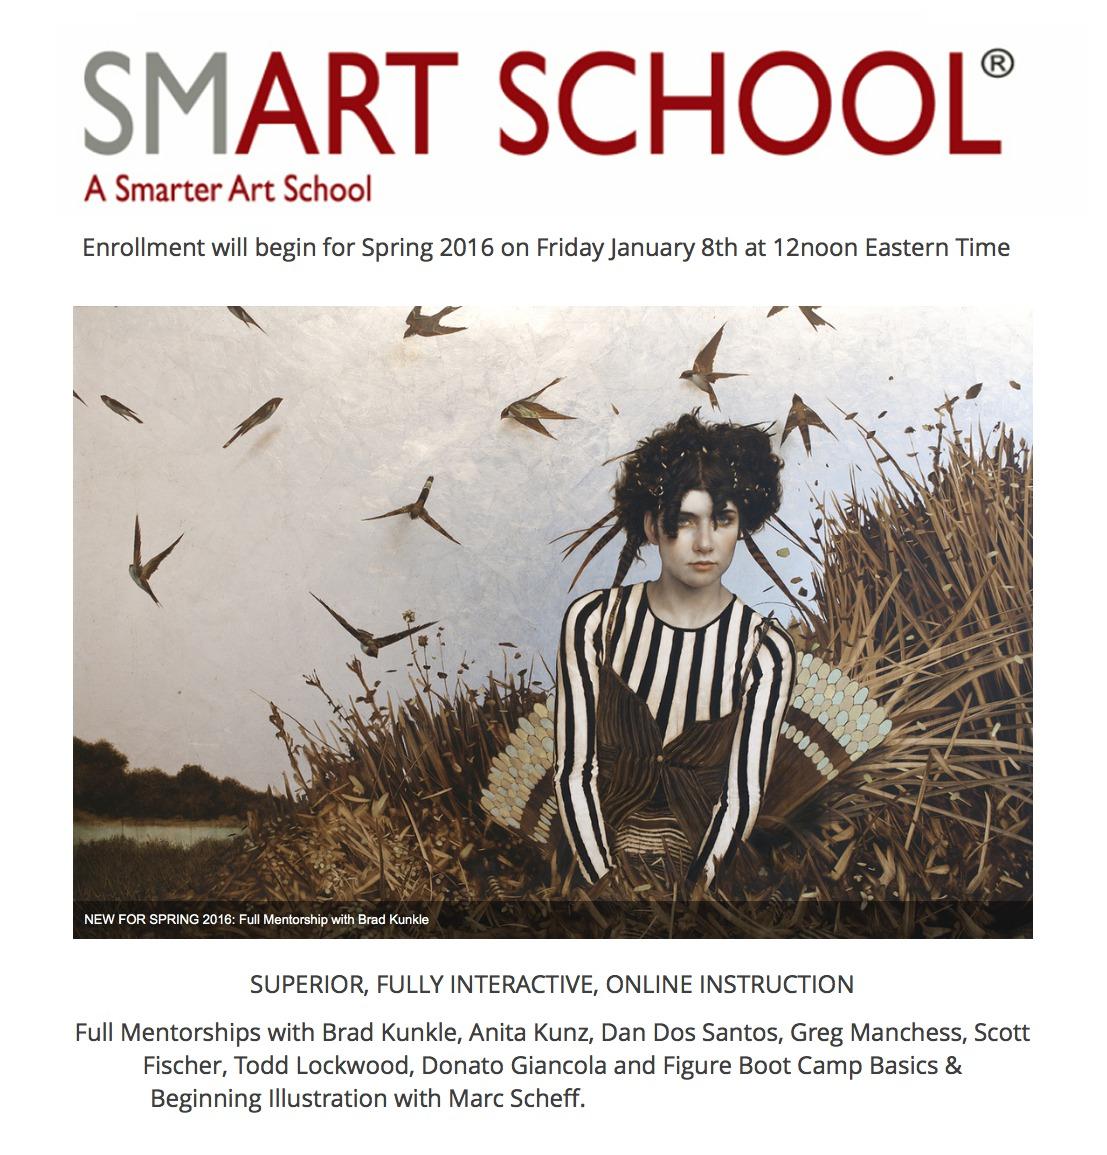 Smart School Enrollment Opening Friday